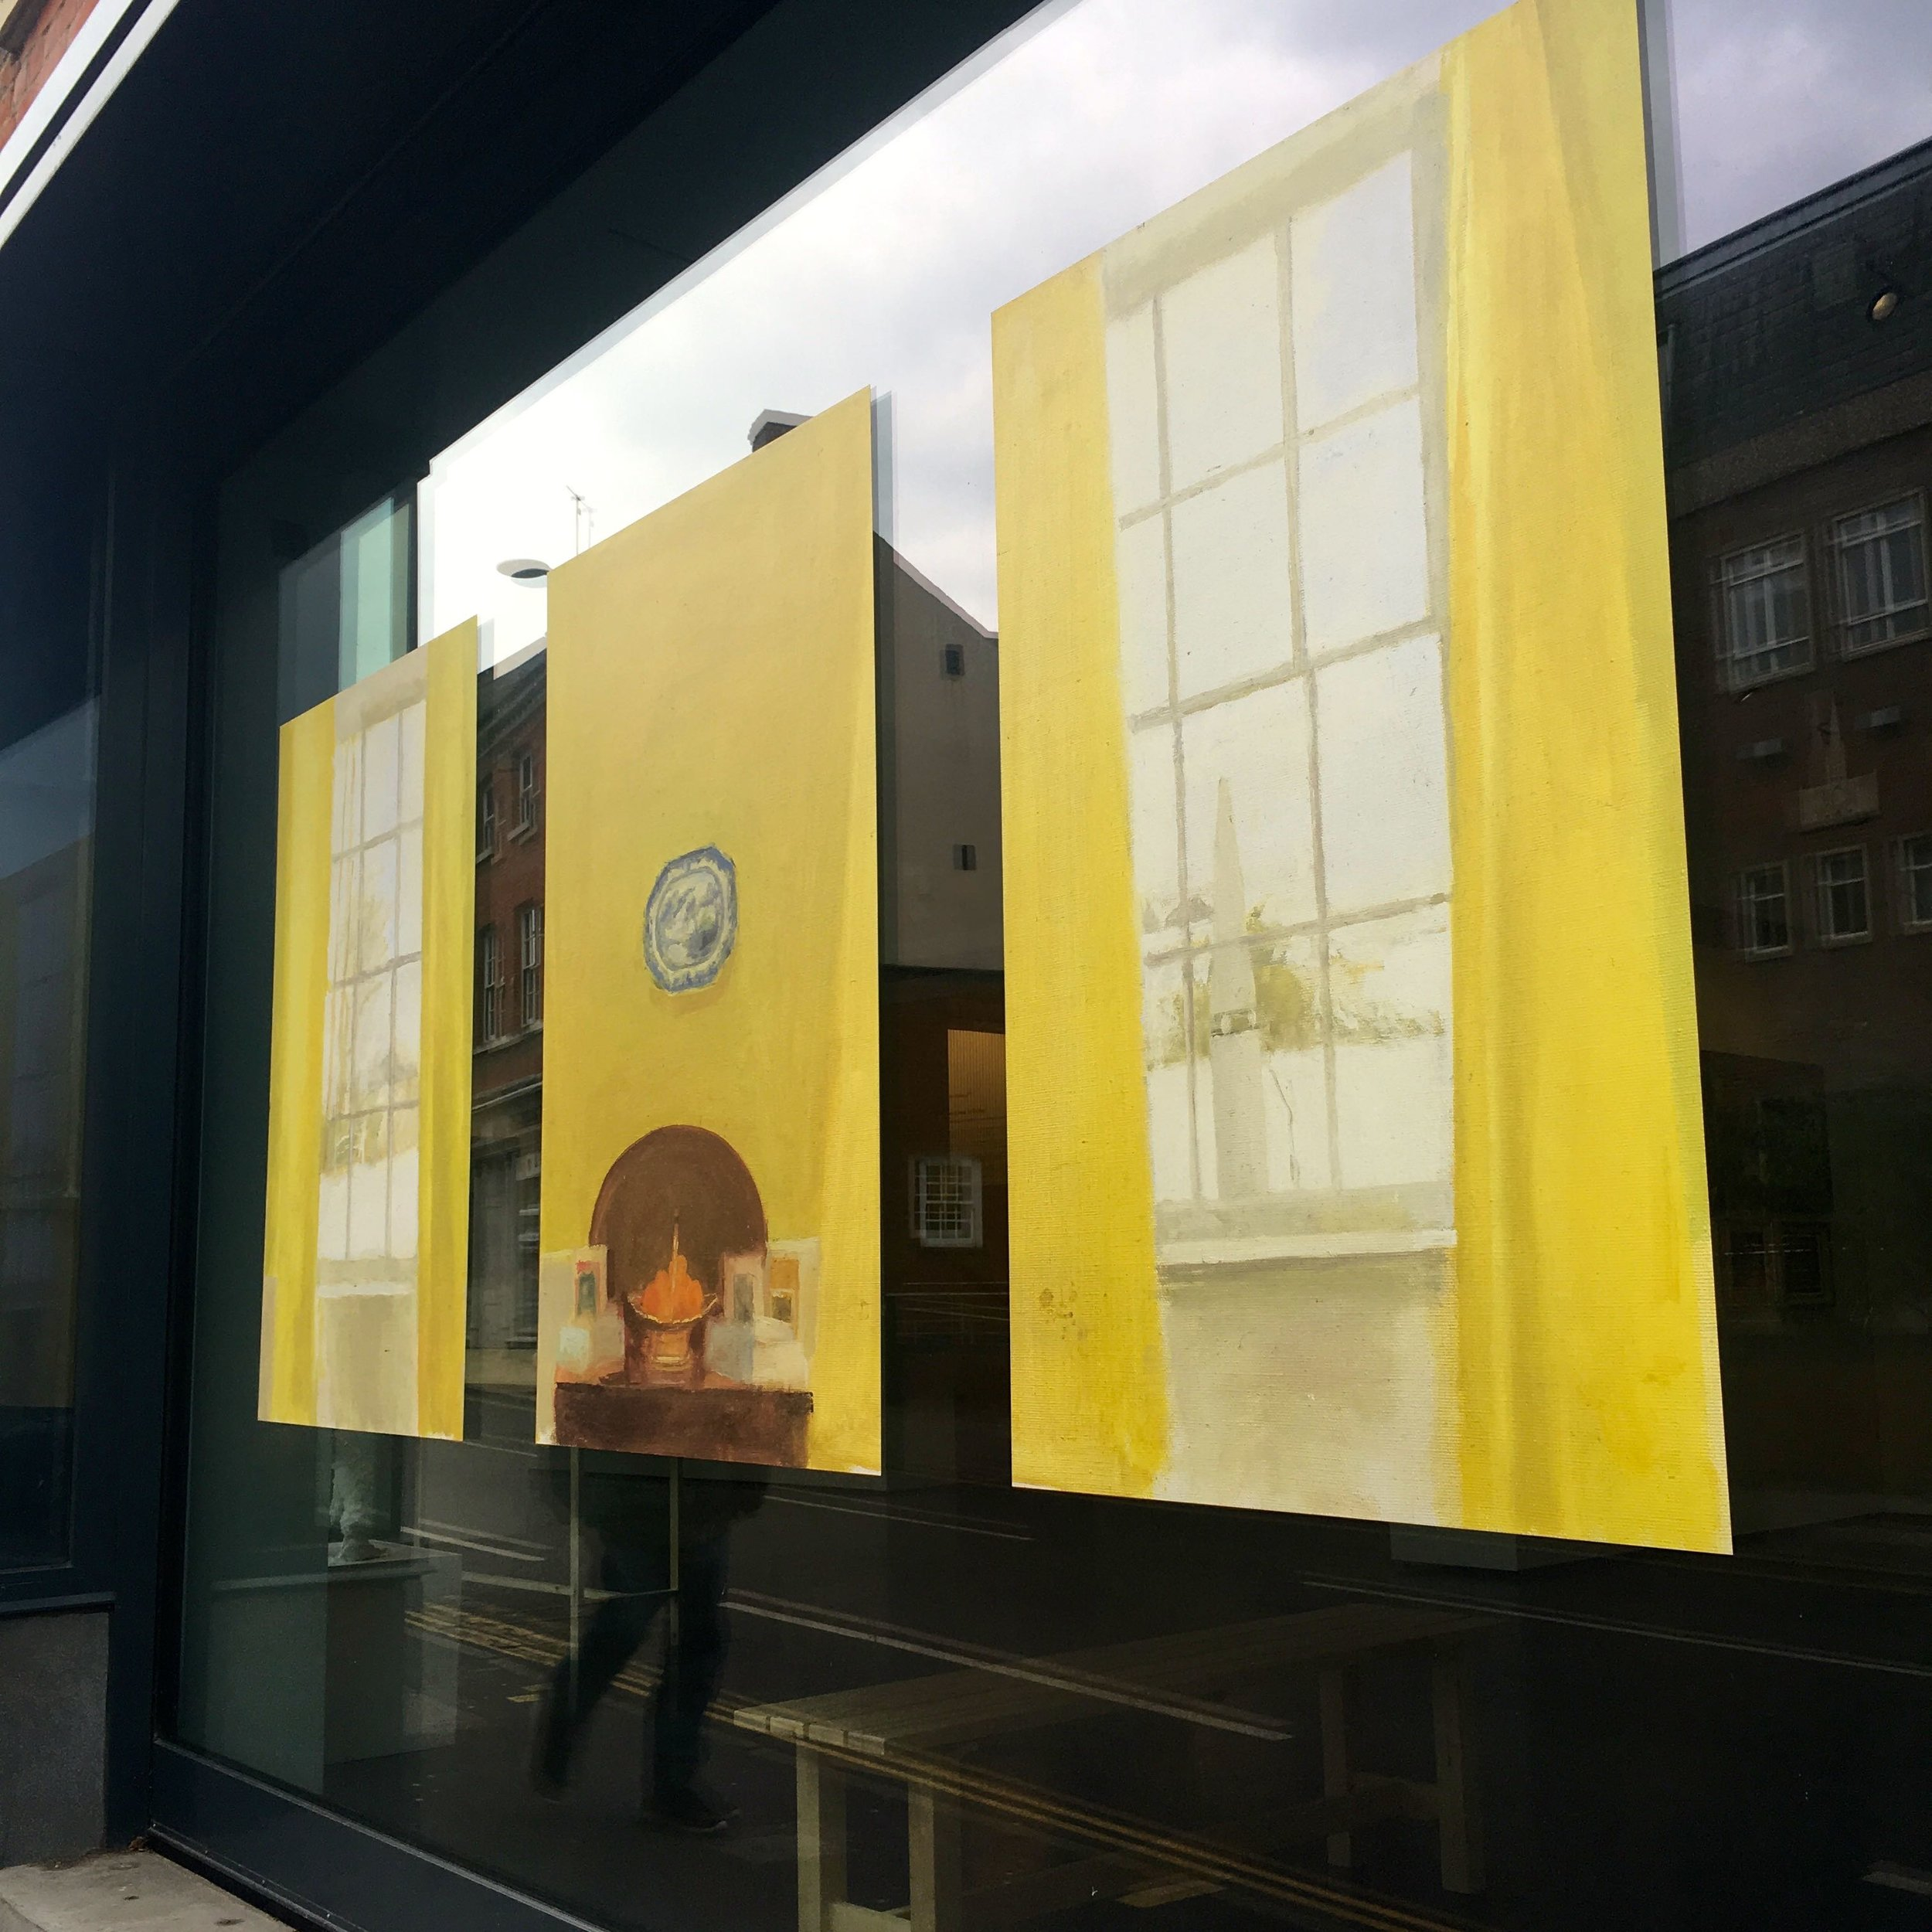 Around Norwich - an interesting window display